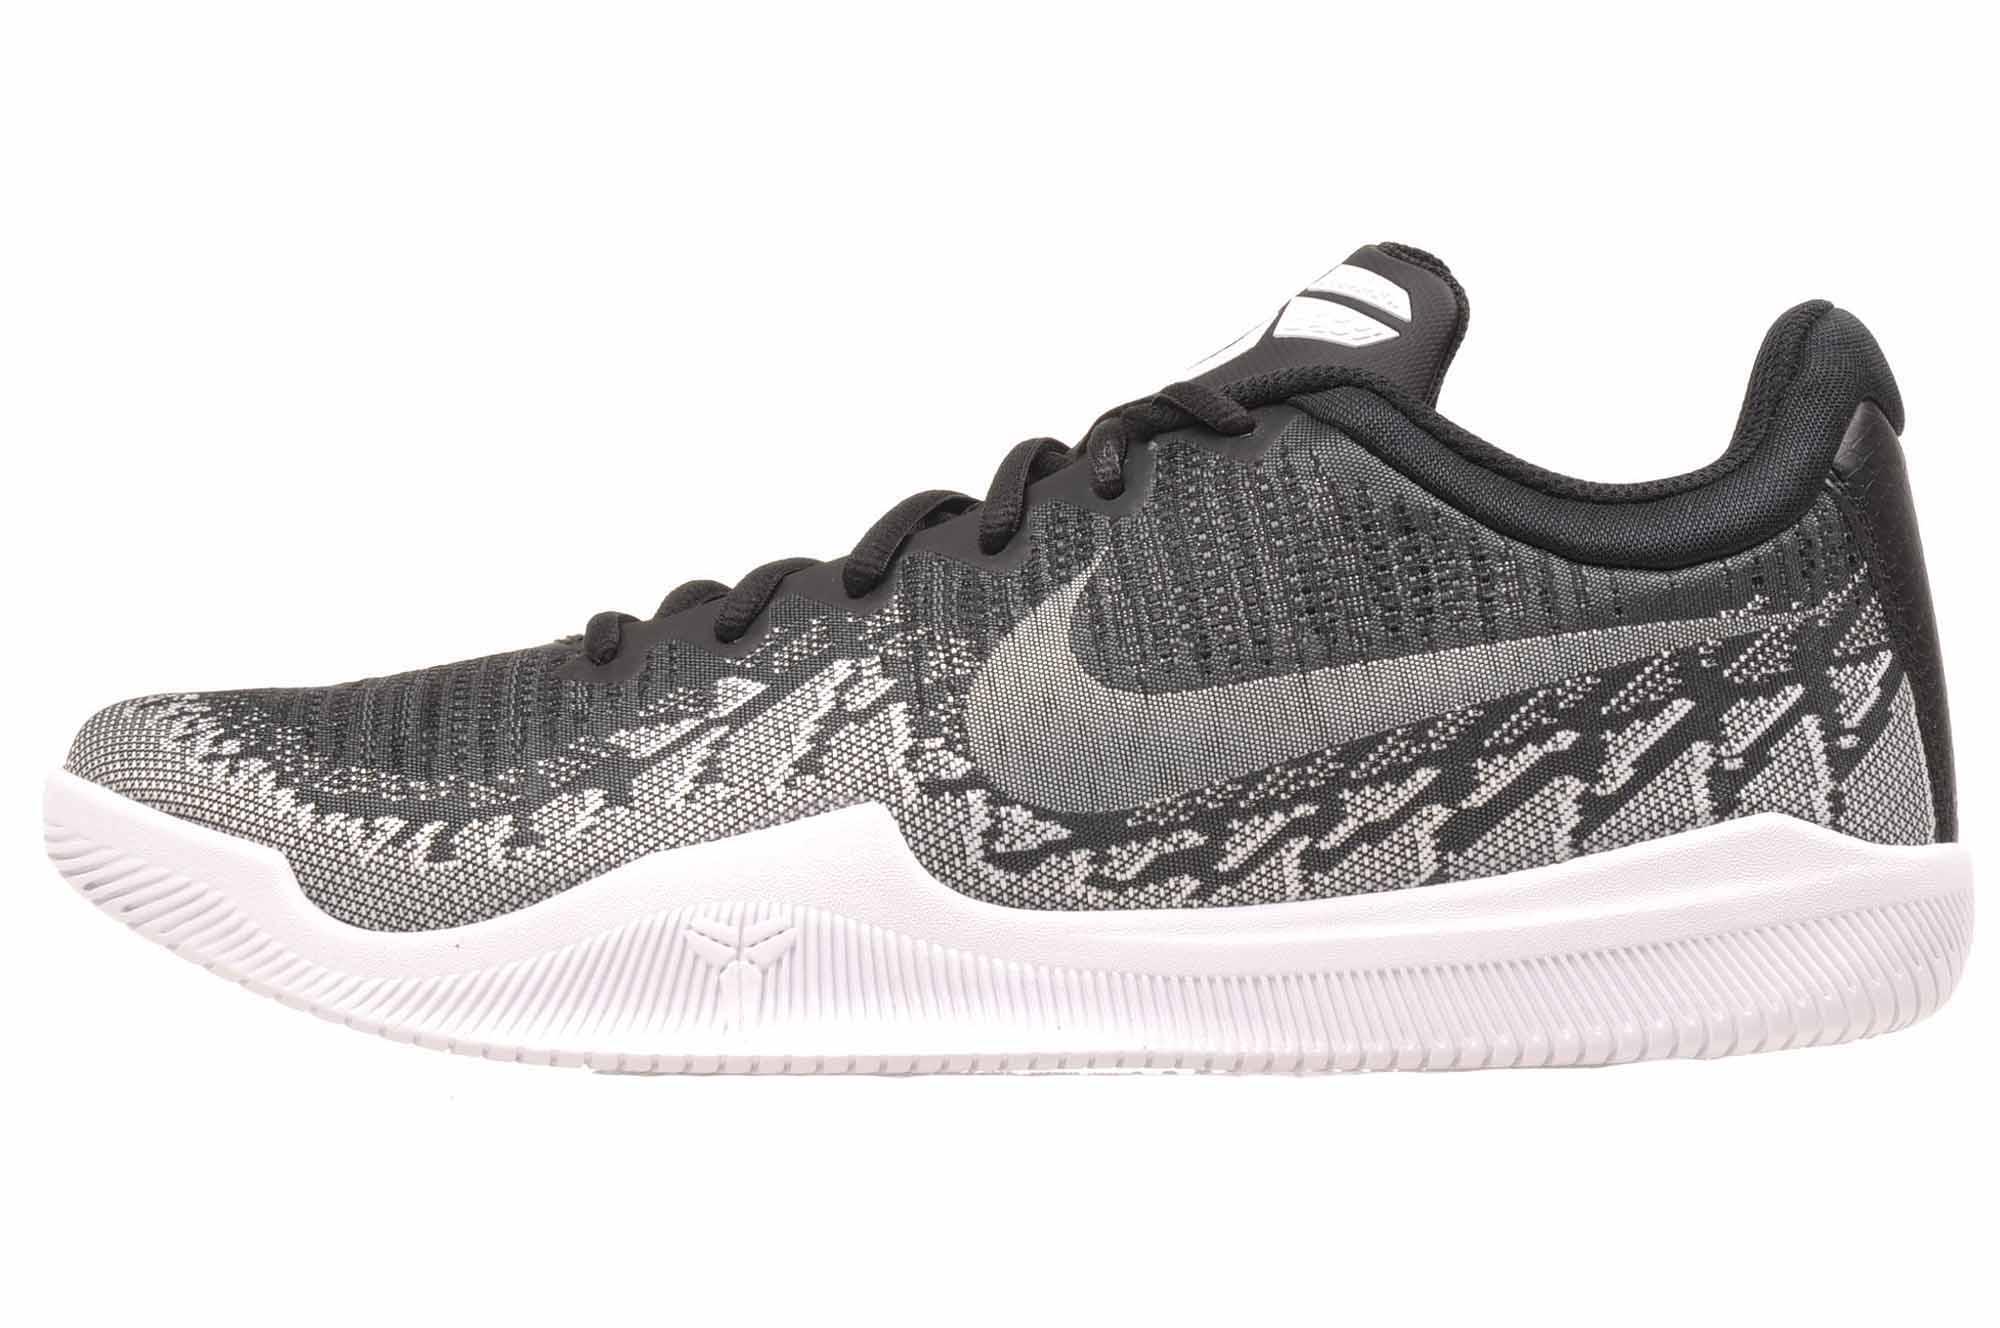 5e1010aa5335 Nike Mamba Rage Basketball Kobe Mens Shoes Anthracite Black 908972 ...